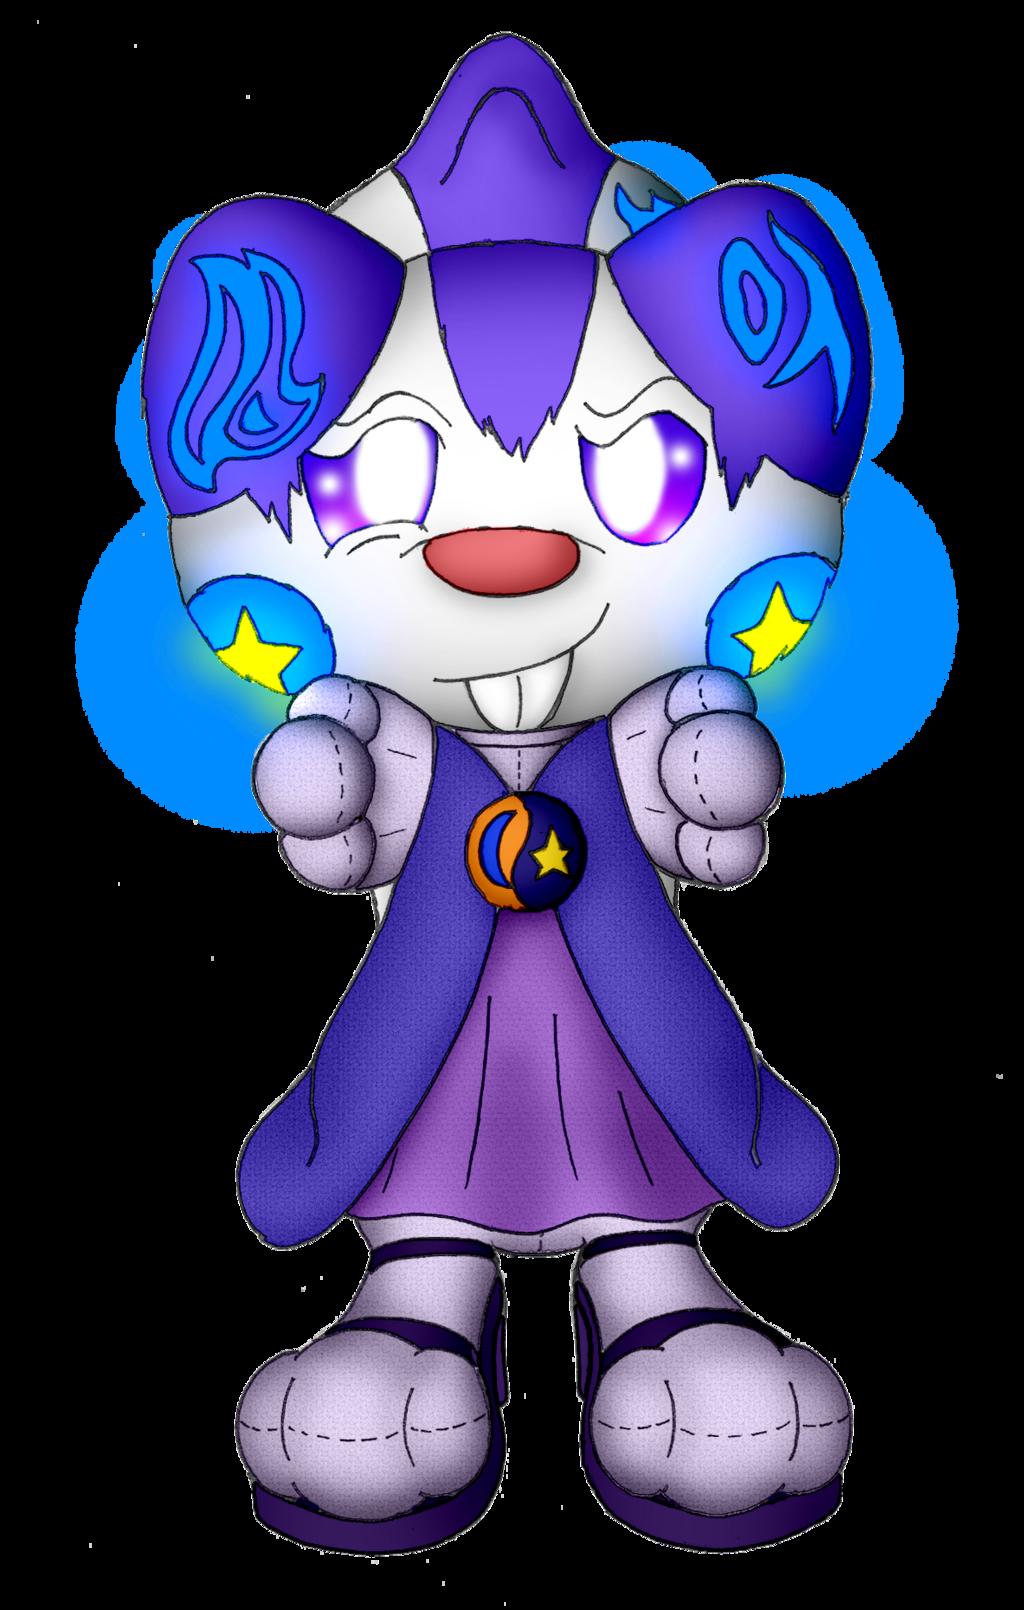 Aeaea the Pachirisu Sorceress (Commission)